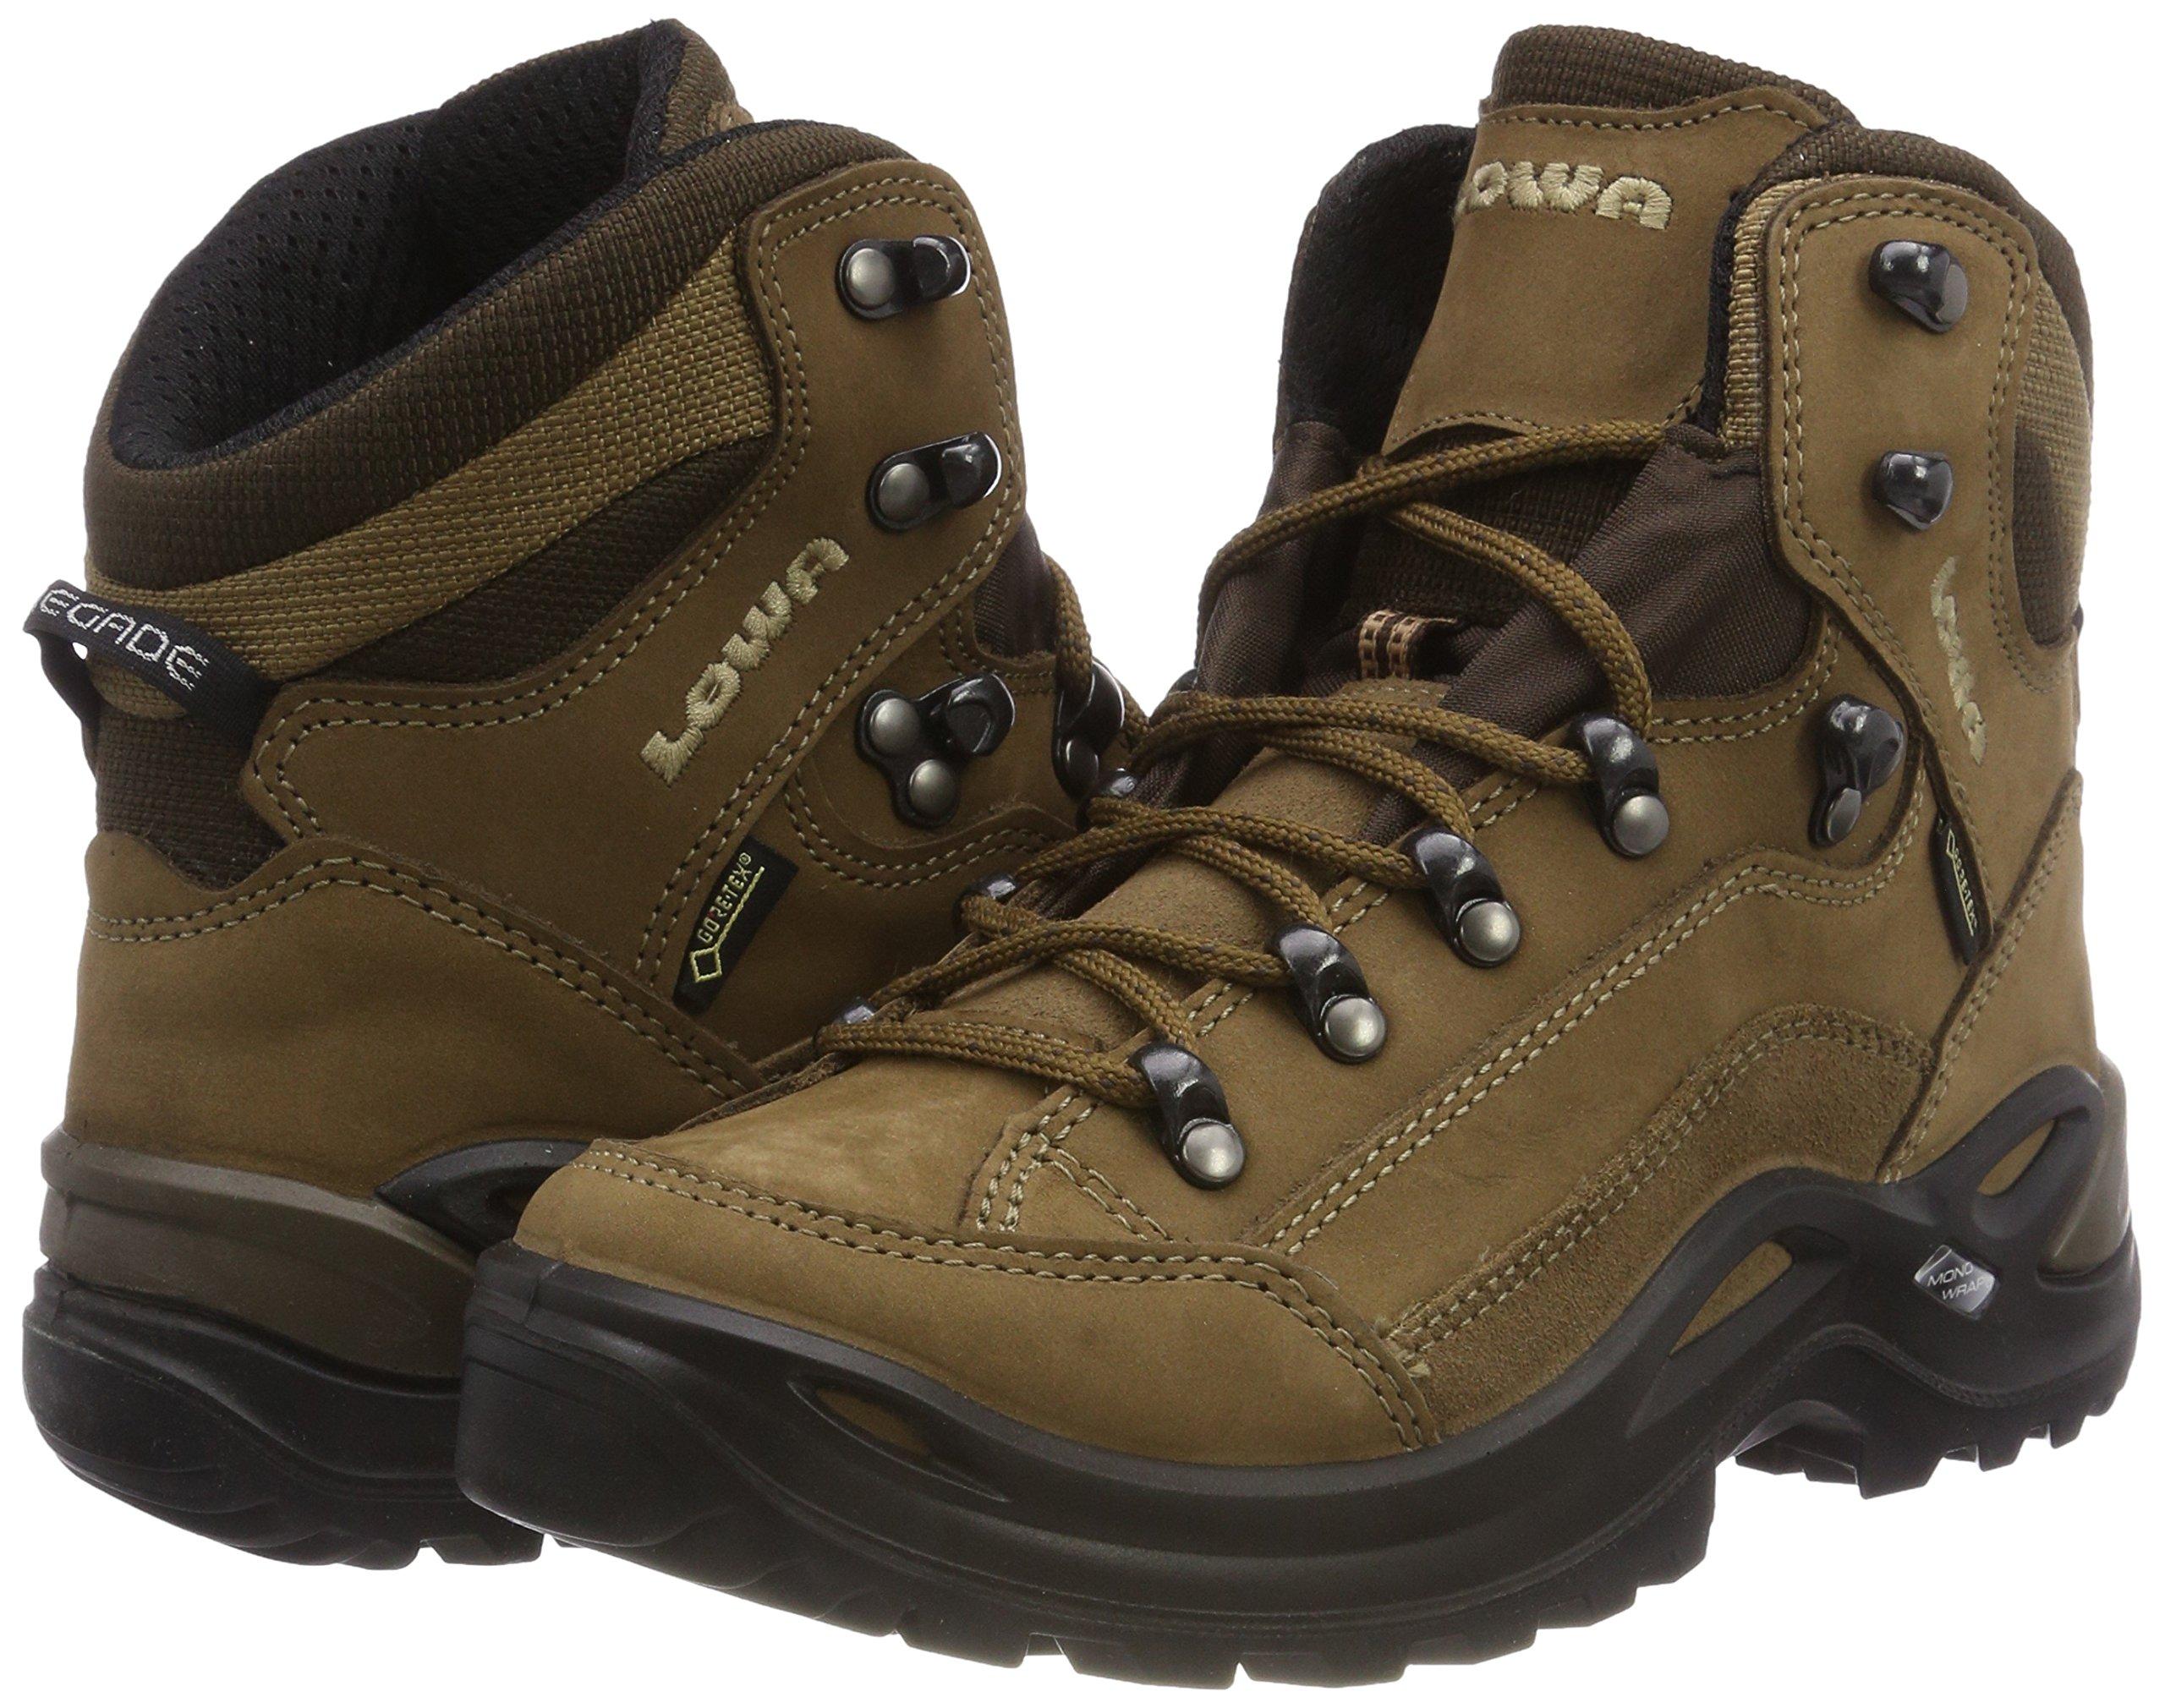 91mXvVicGSL - Lowa RENAGADE GTX MID Ws 320945/9768 Unisex-Adult Hiking Boot